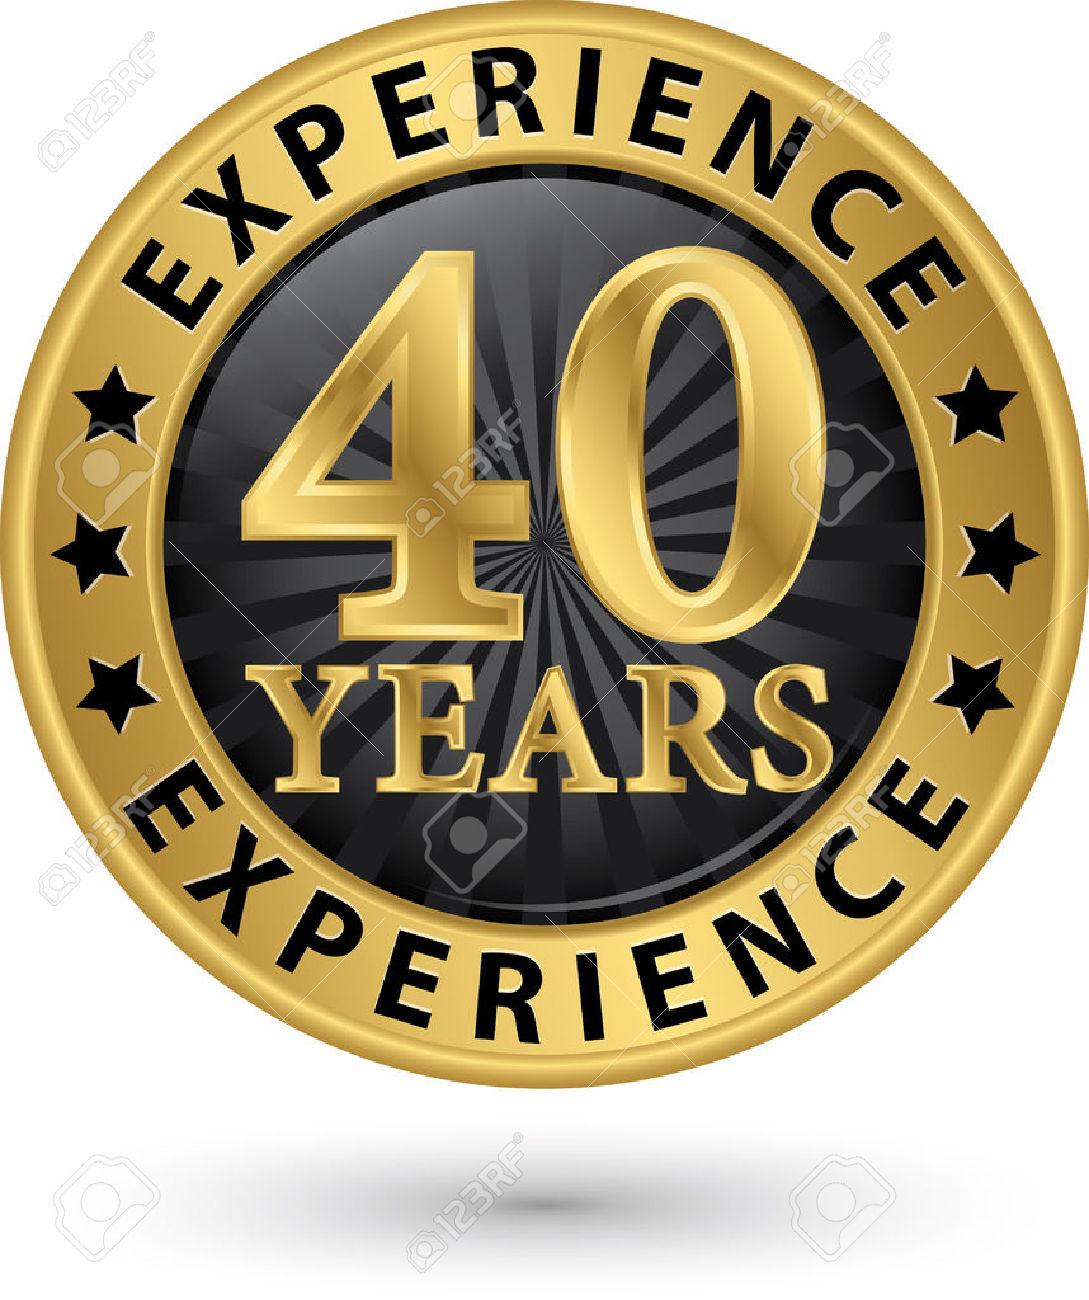 jubileum 40 jaar Sturkenboom Advocaten viert 40 jarig jubileum!   Sturkenboom Advocaten jubileum 40 jaar